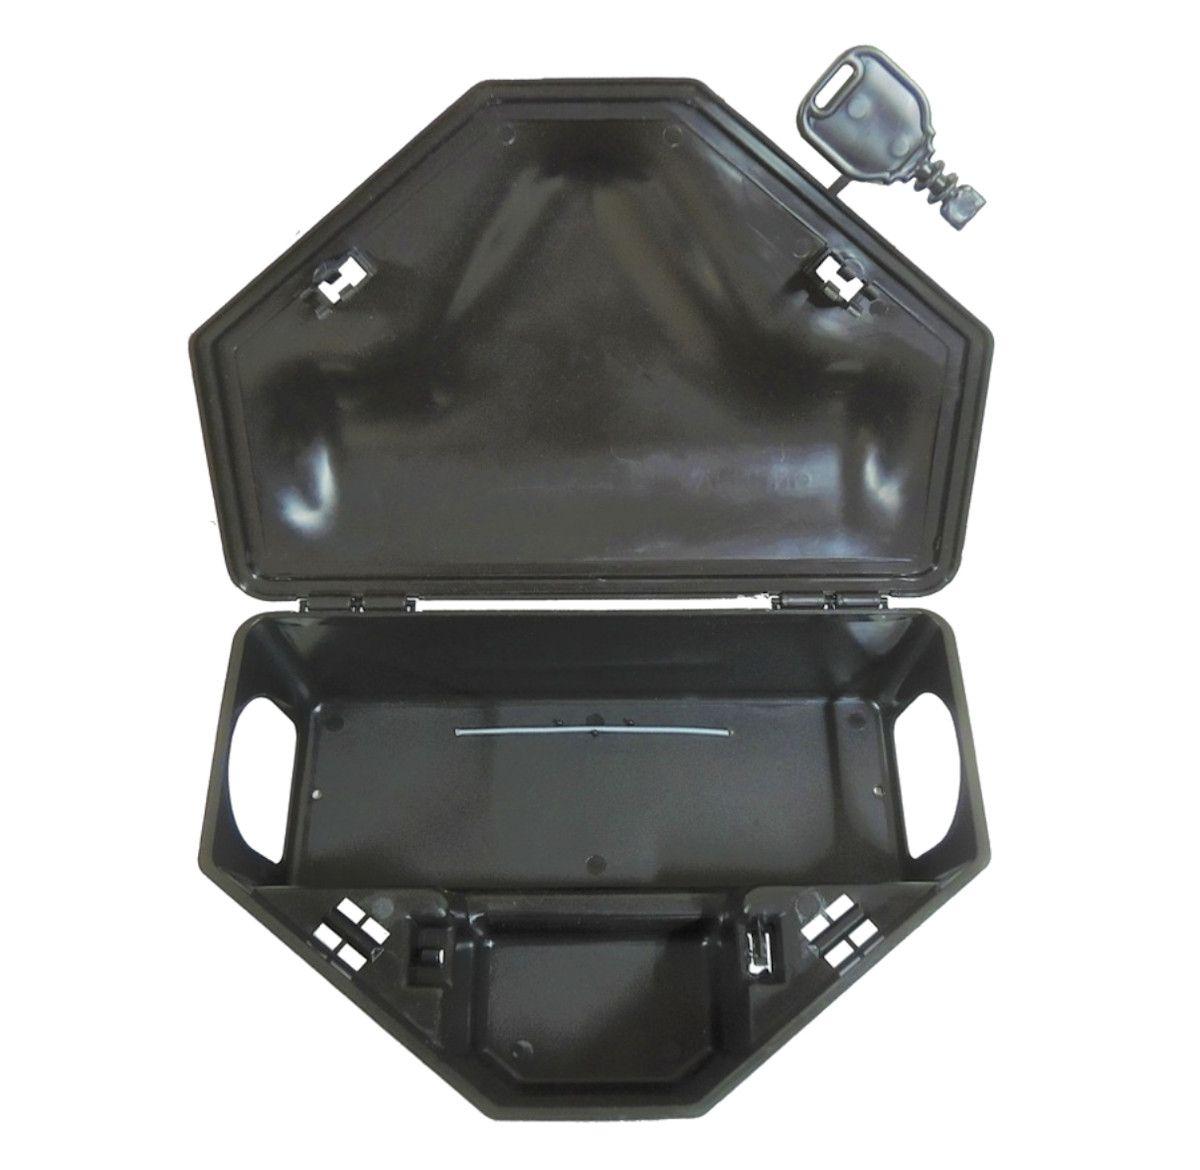 Kit 36 Porta Isca Com 2 Chaves - Duplo Travamento